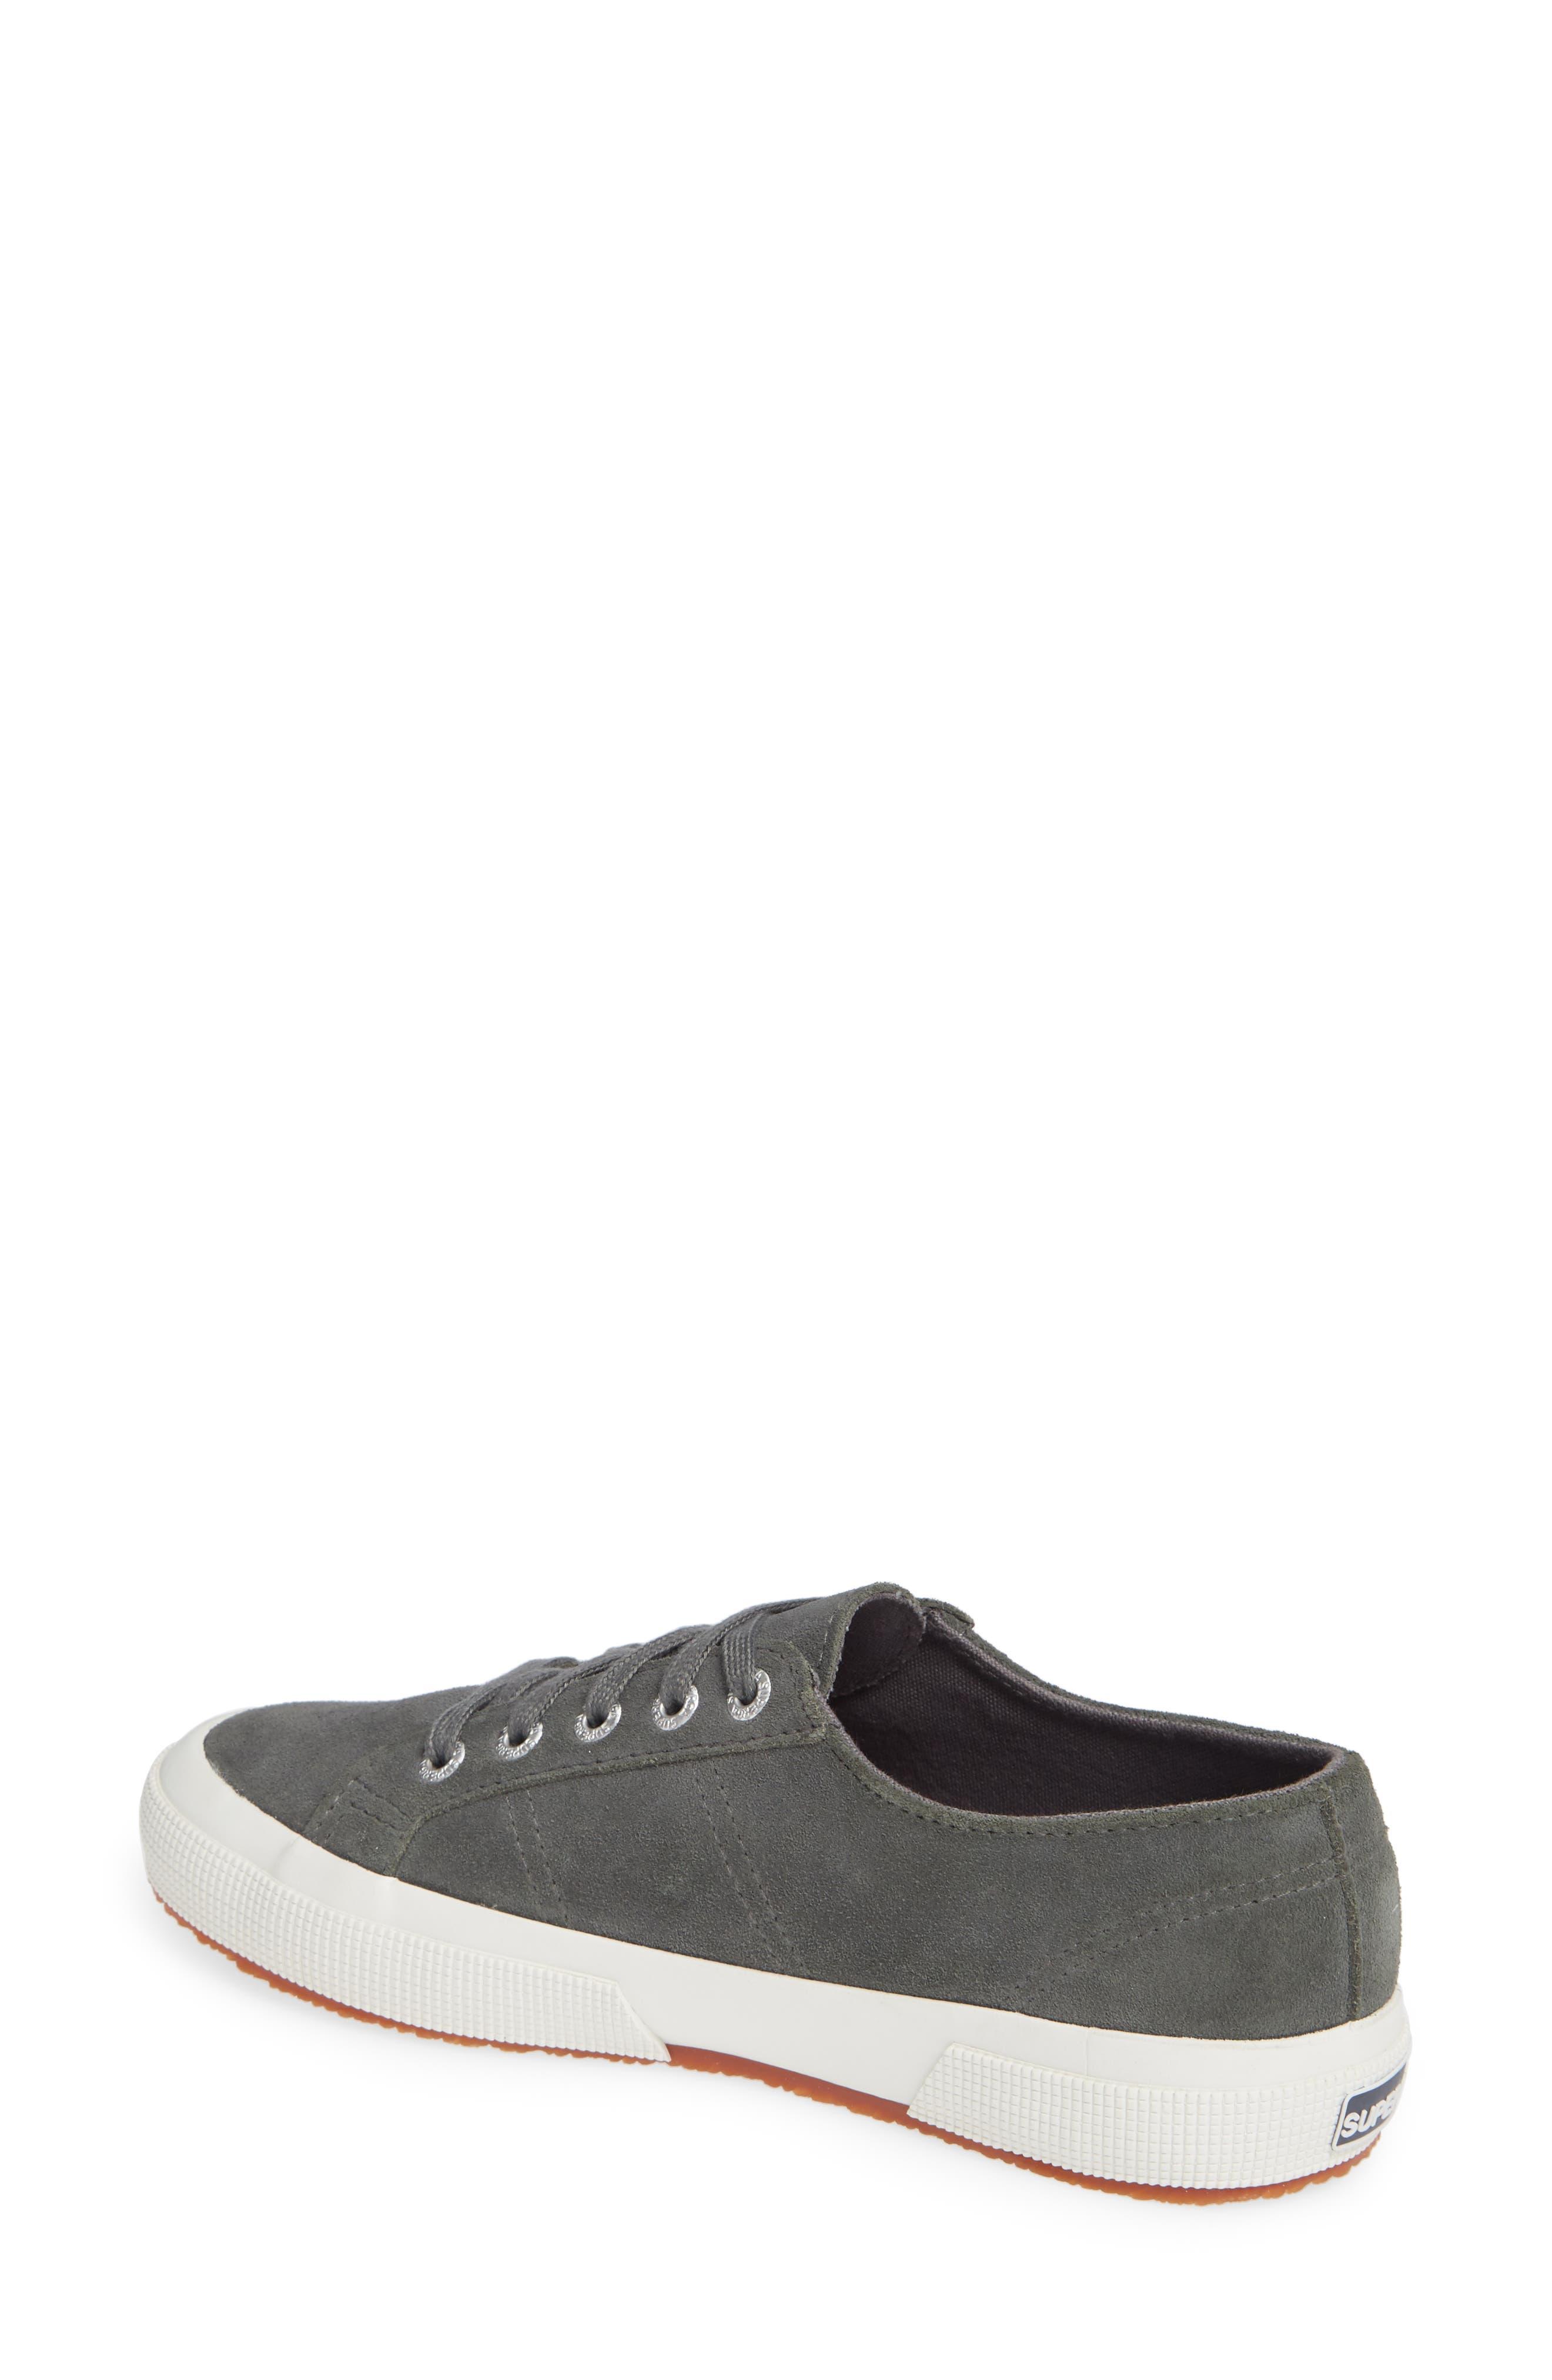 2750 Suecotw Low Top Sneaker,                             Alternate thumbnail 2, color,                             DARK GREY SUEDE